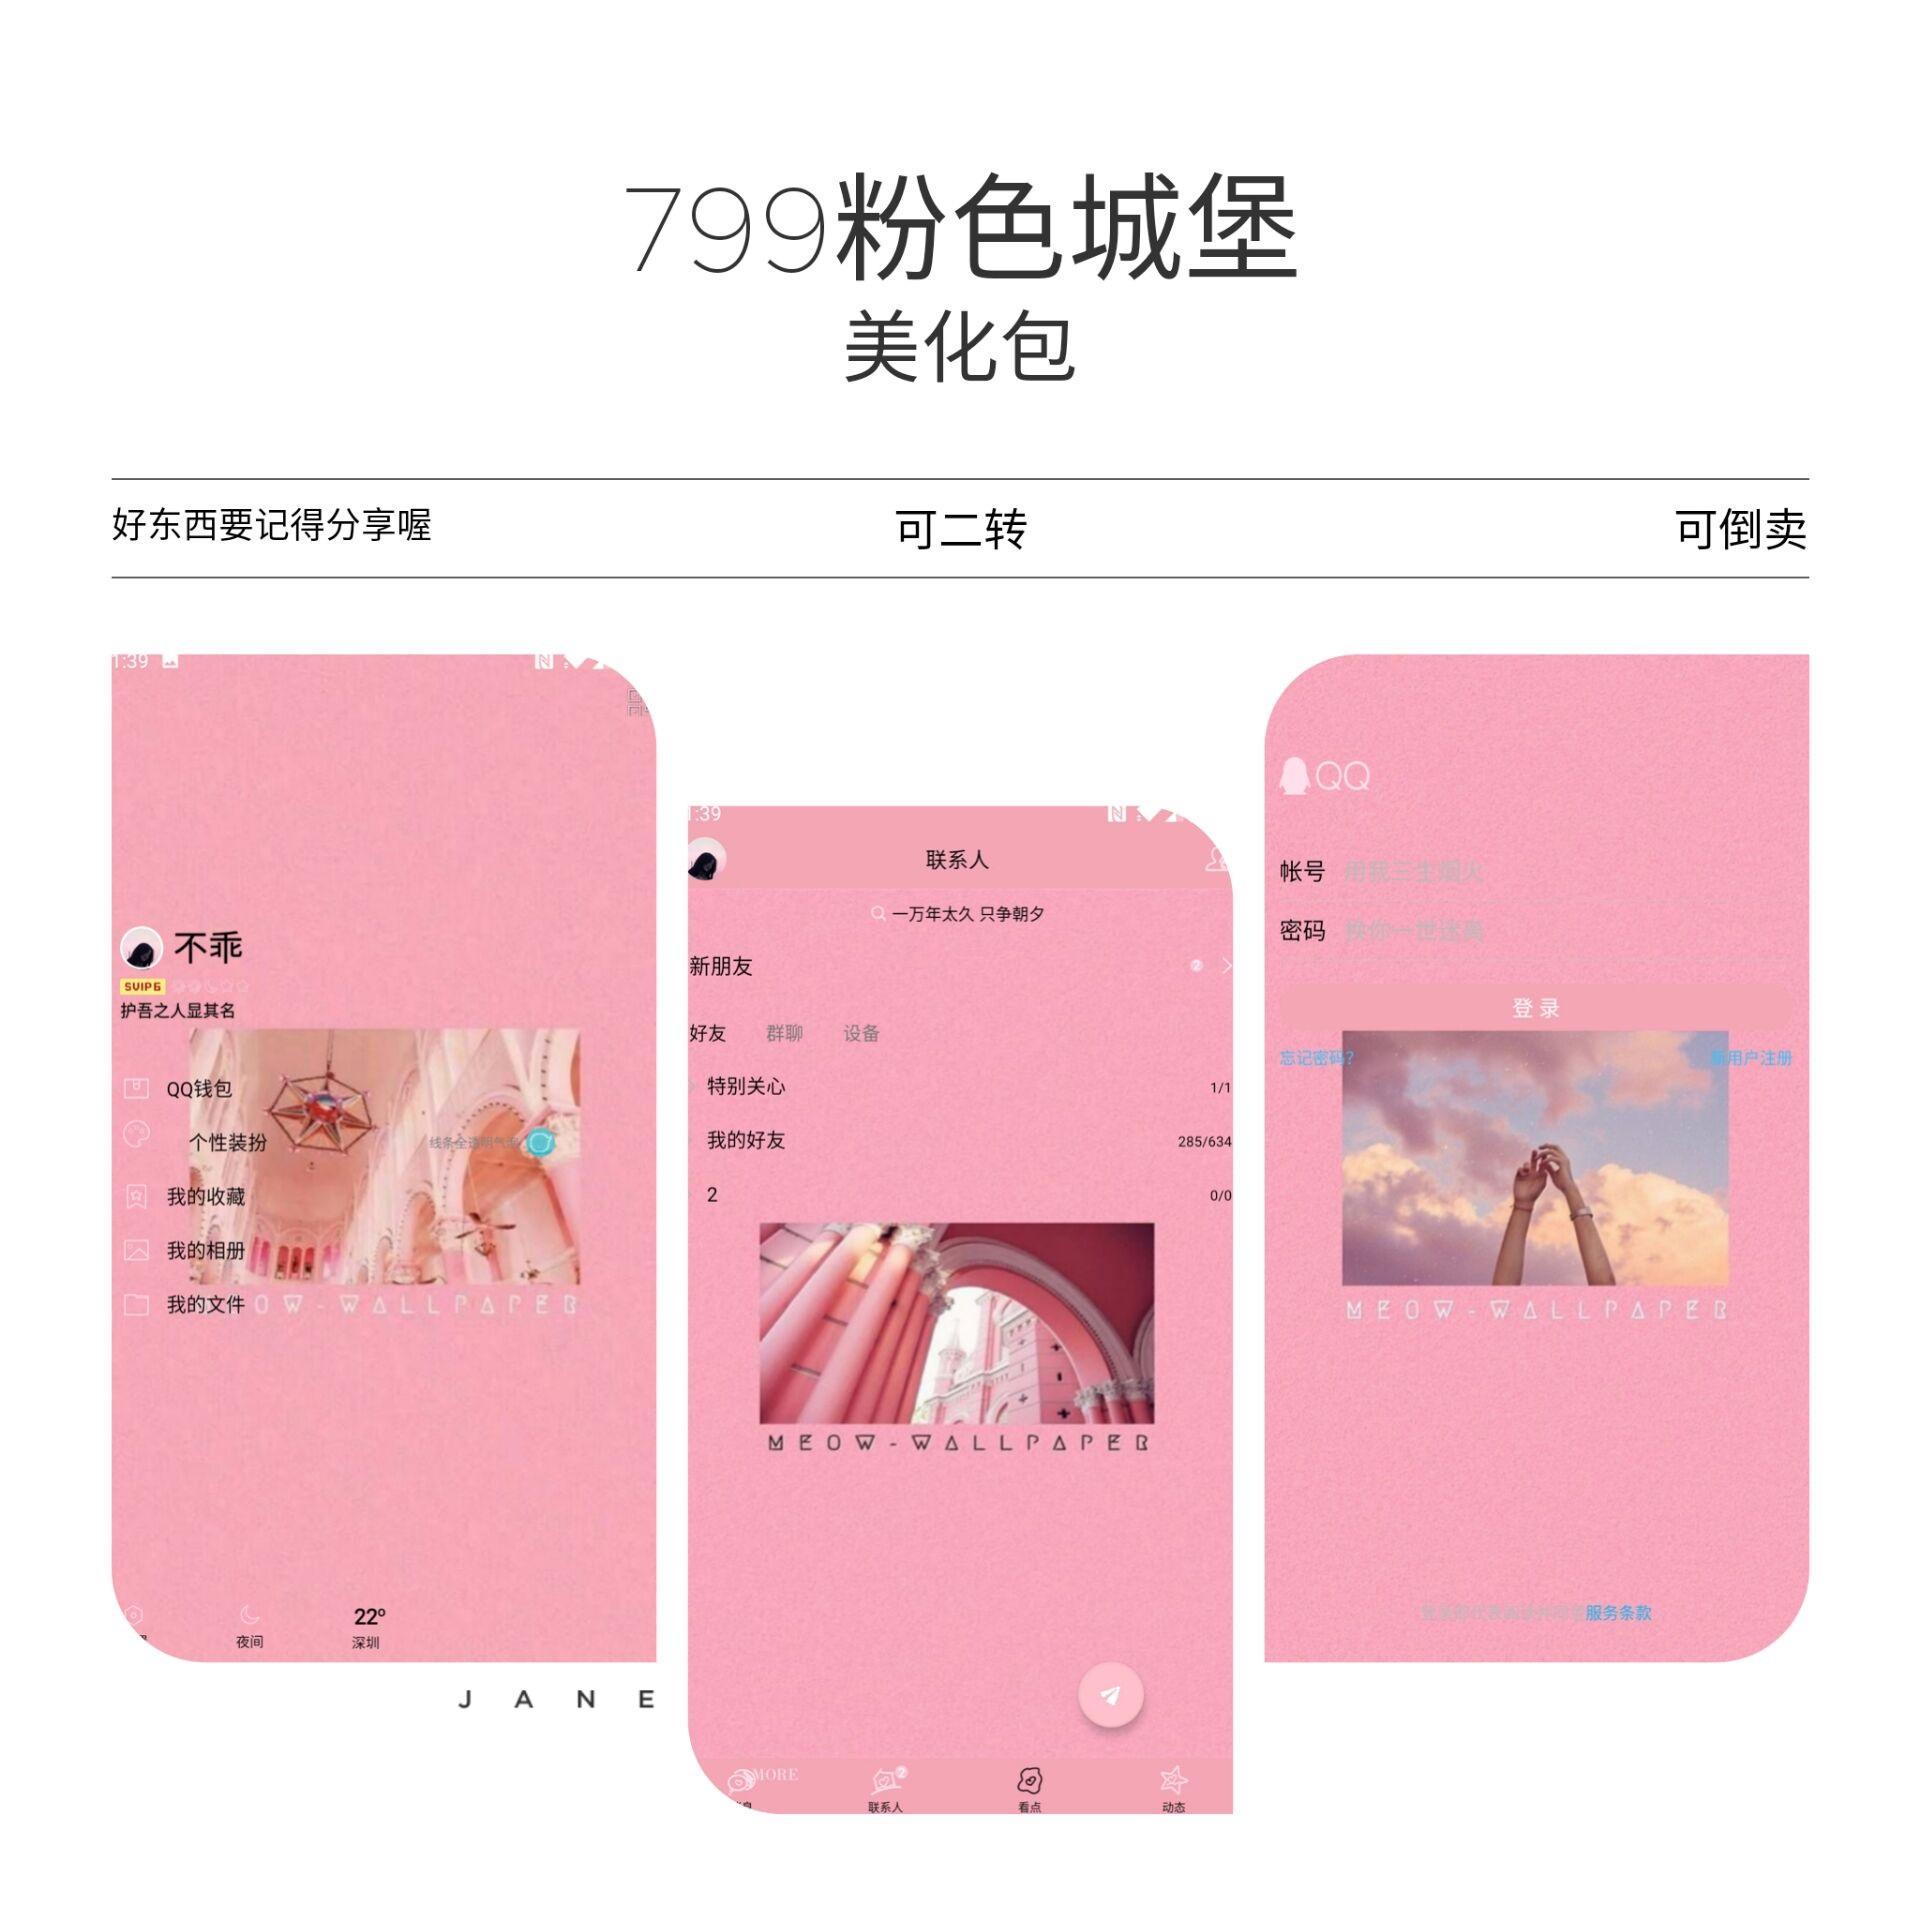 QQ美化包799粉色城堡防撤回